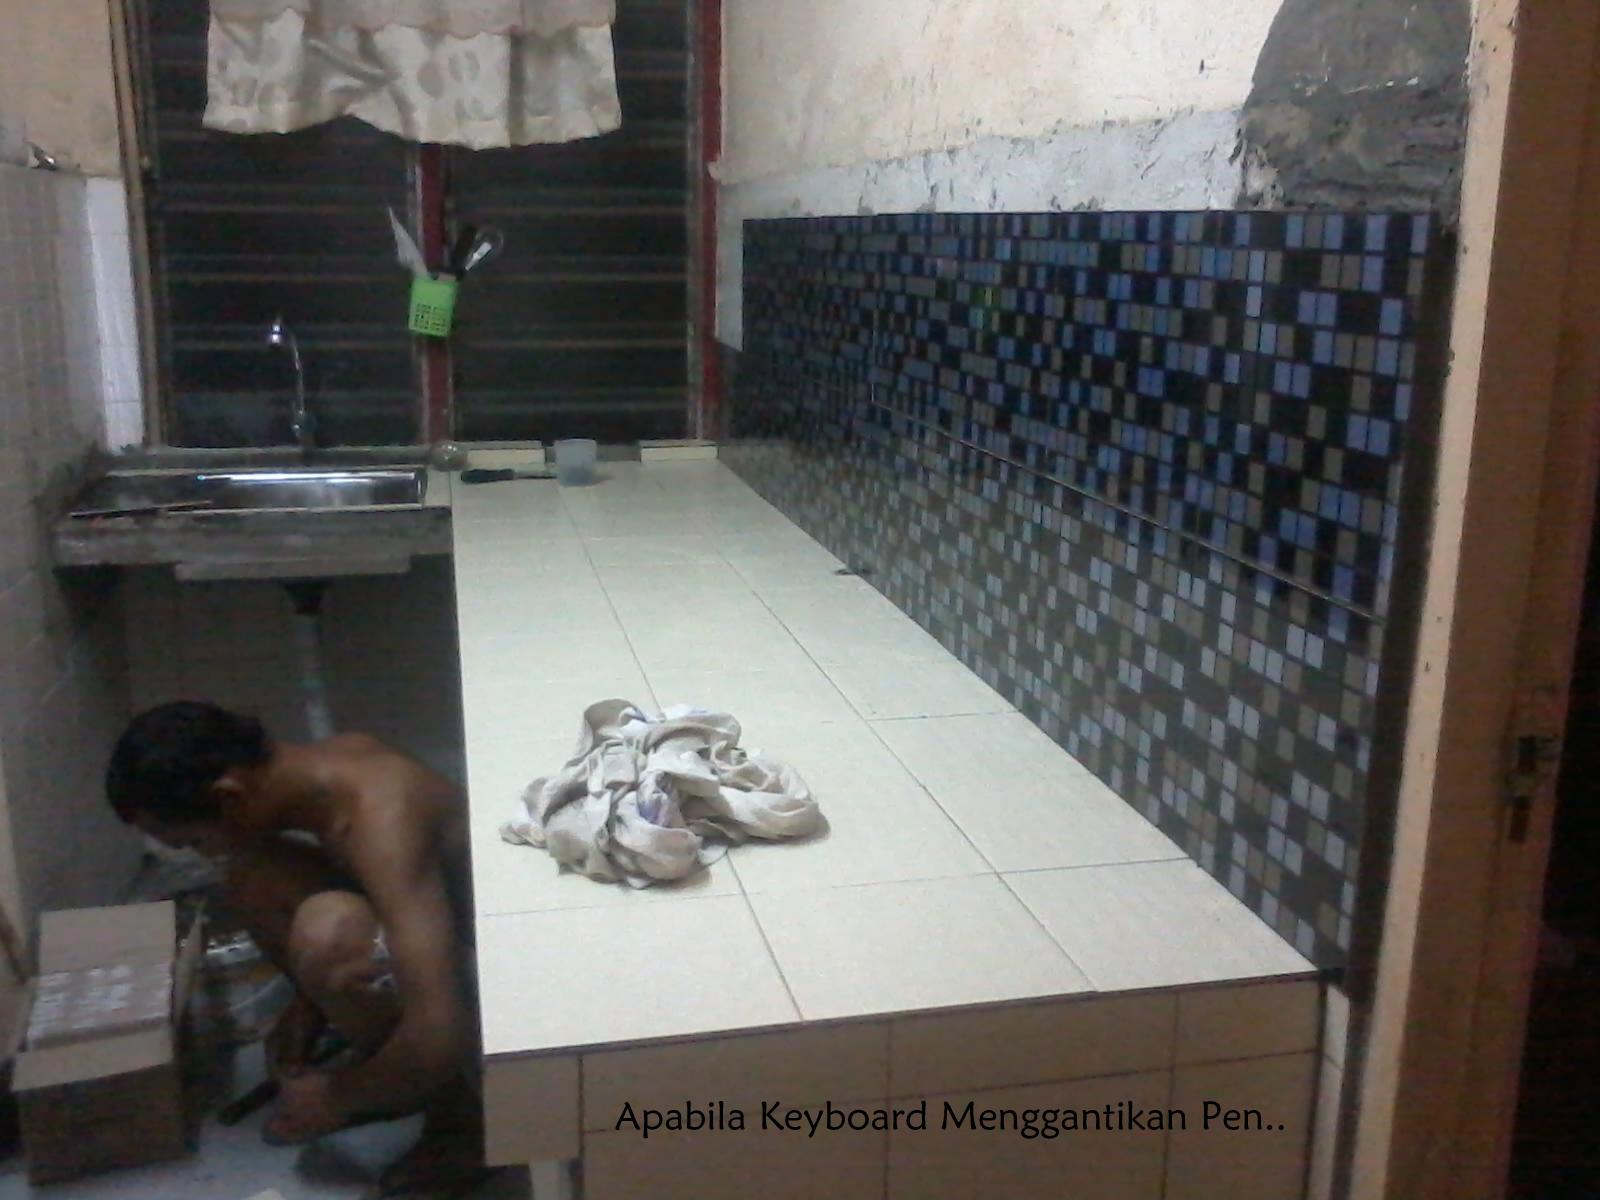 Sebab Tu La Aku Focus Nk Renovate Dapur Dlu Yang Lain2 Kemudian Pon Xpe Janji Duit Ade Je Ape Bole